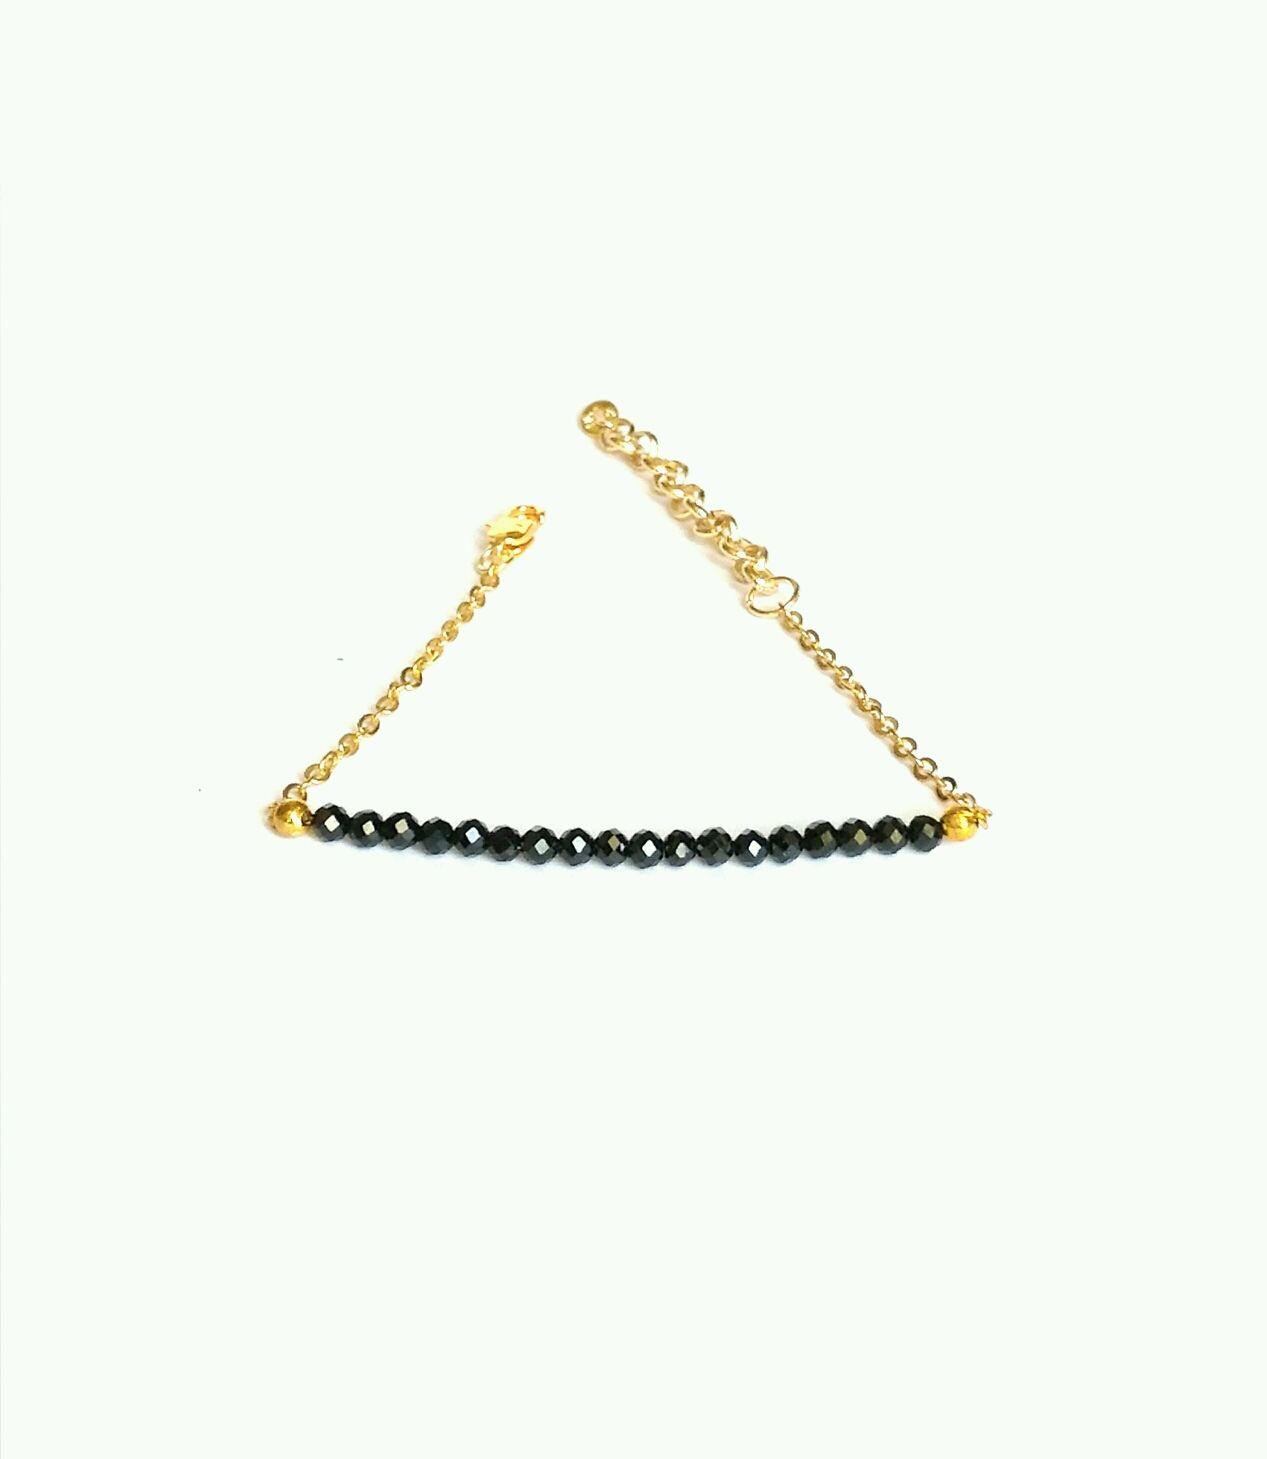 Bracelet in black spinel Natural stones, Bead bracelet, Moscow,  Фото №1